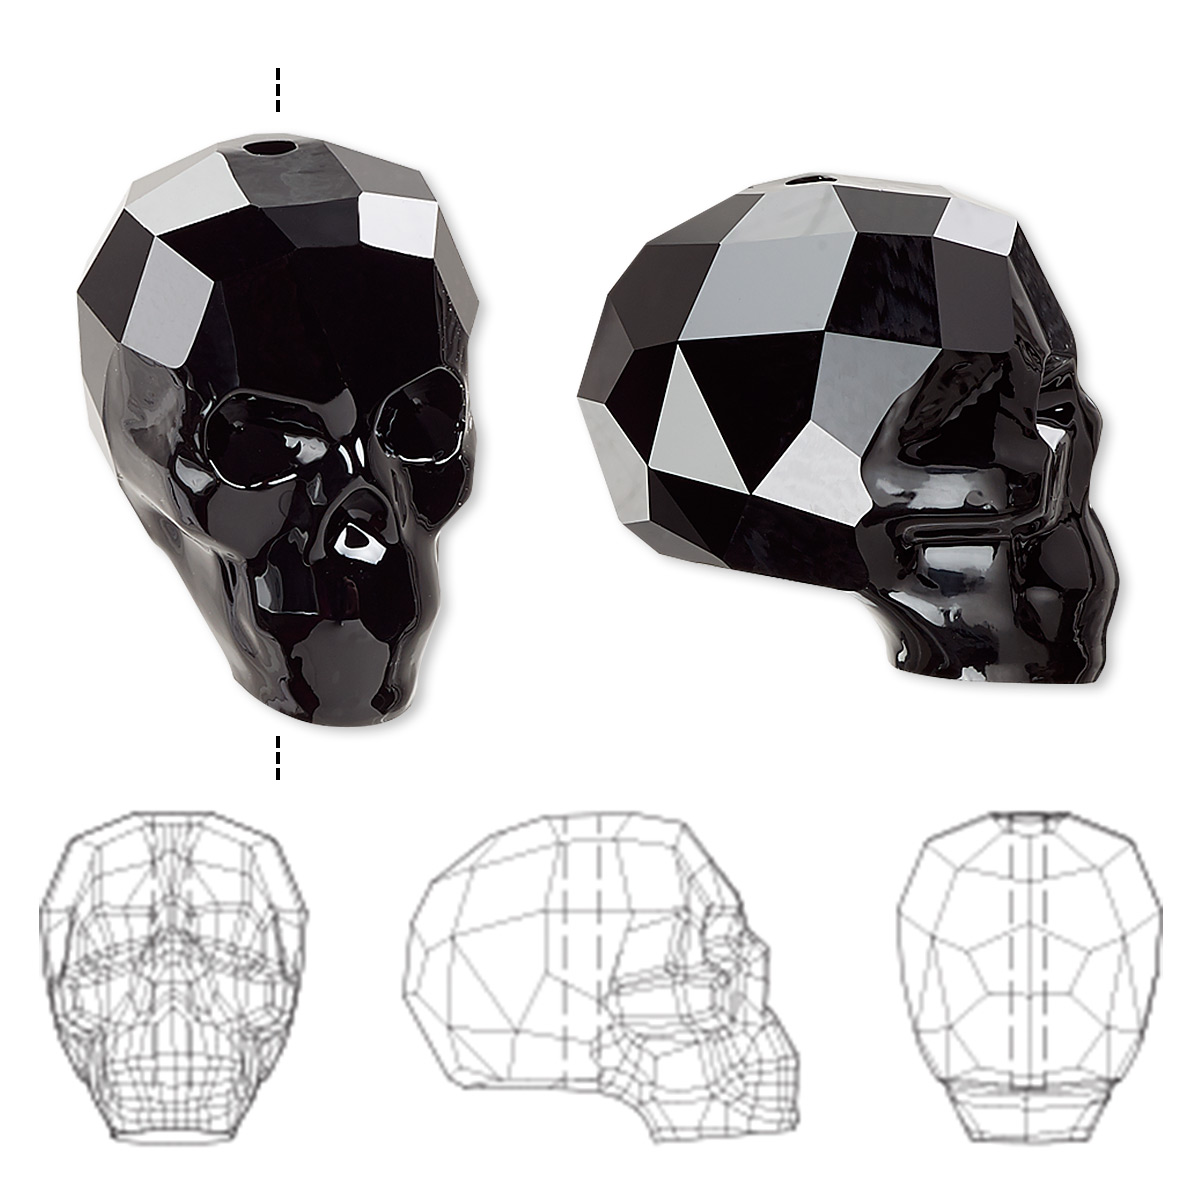 5f69cb8b6b998 Bead, Swarovski® crystals, jet, 19x18x14mm faceted skull (5750 ...